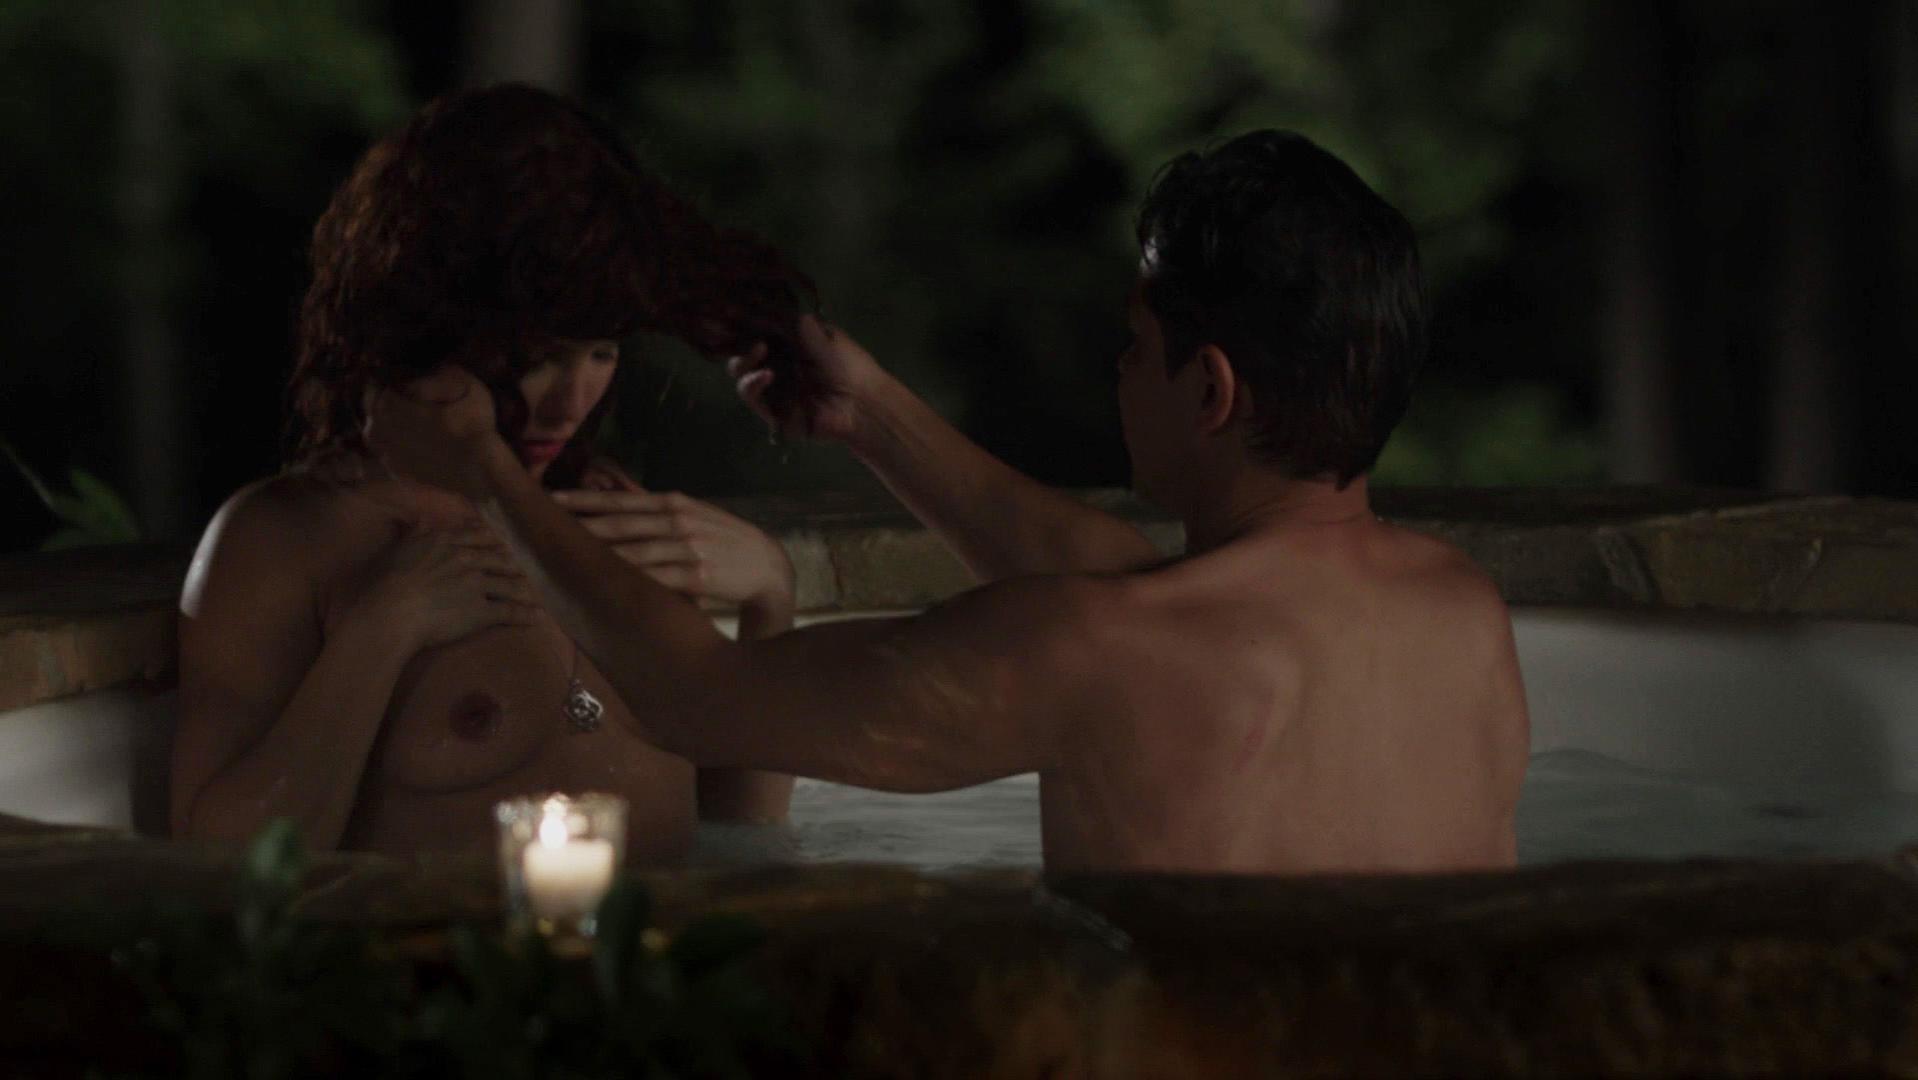 Baby Norman nude - Banshee s02e02 (2014)